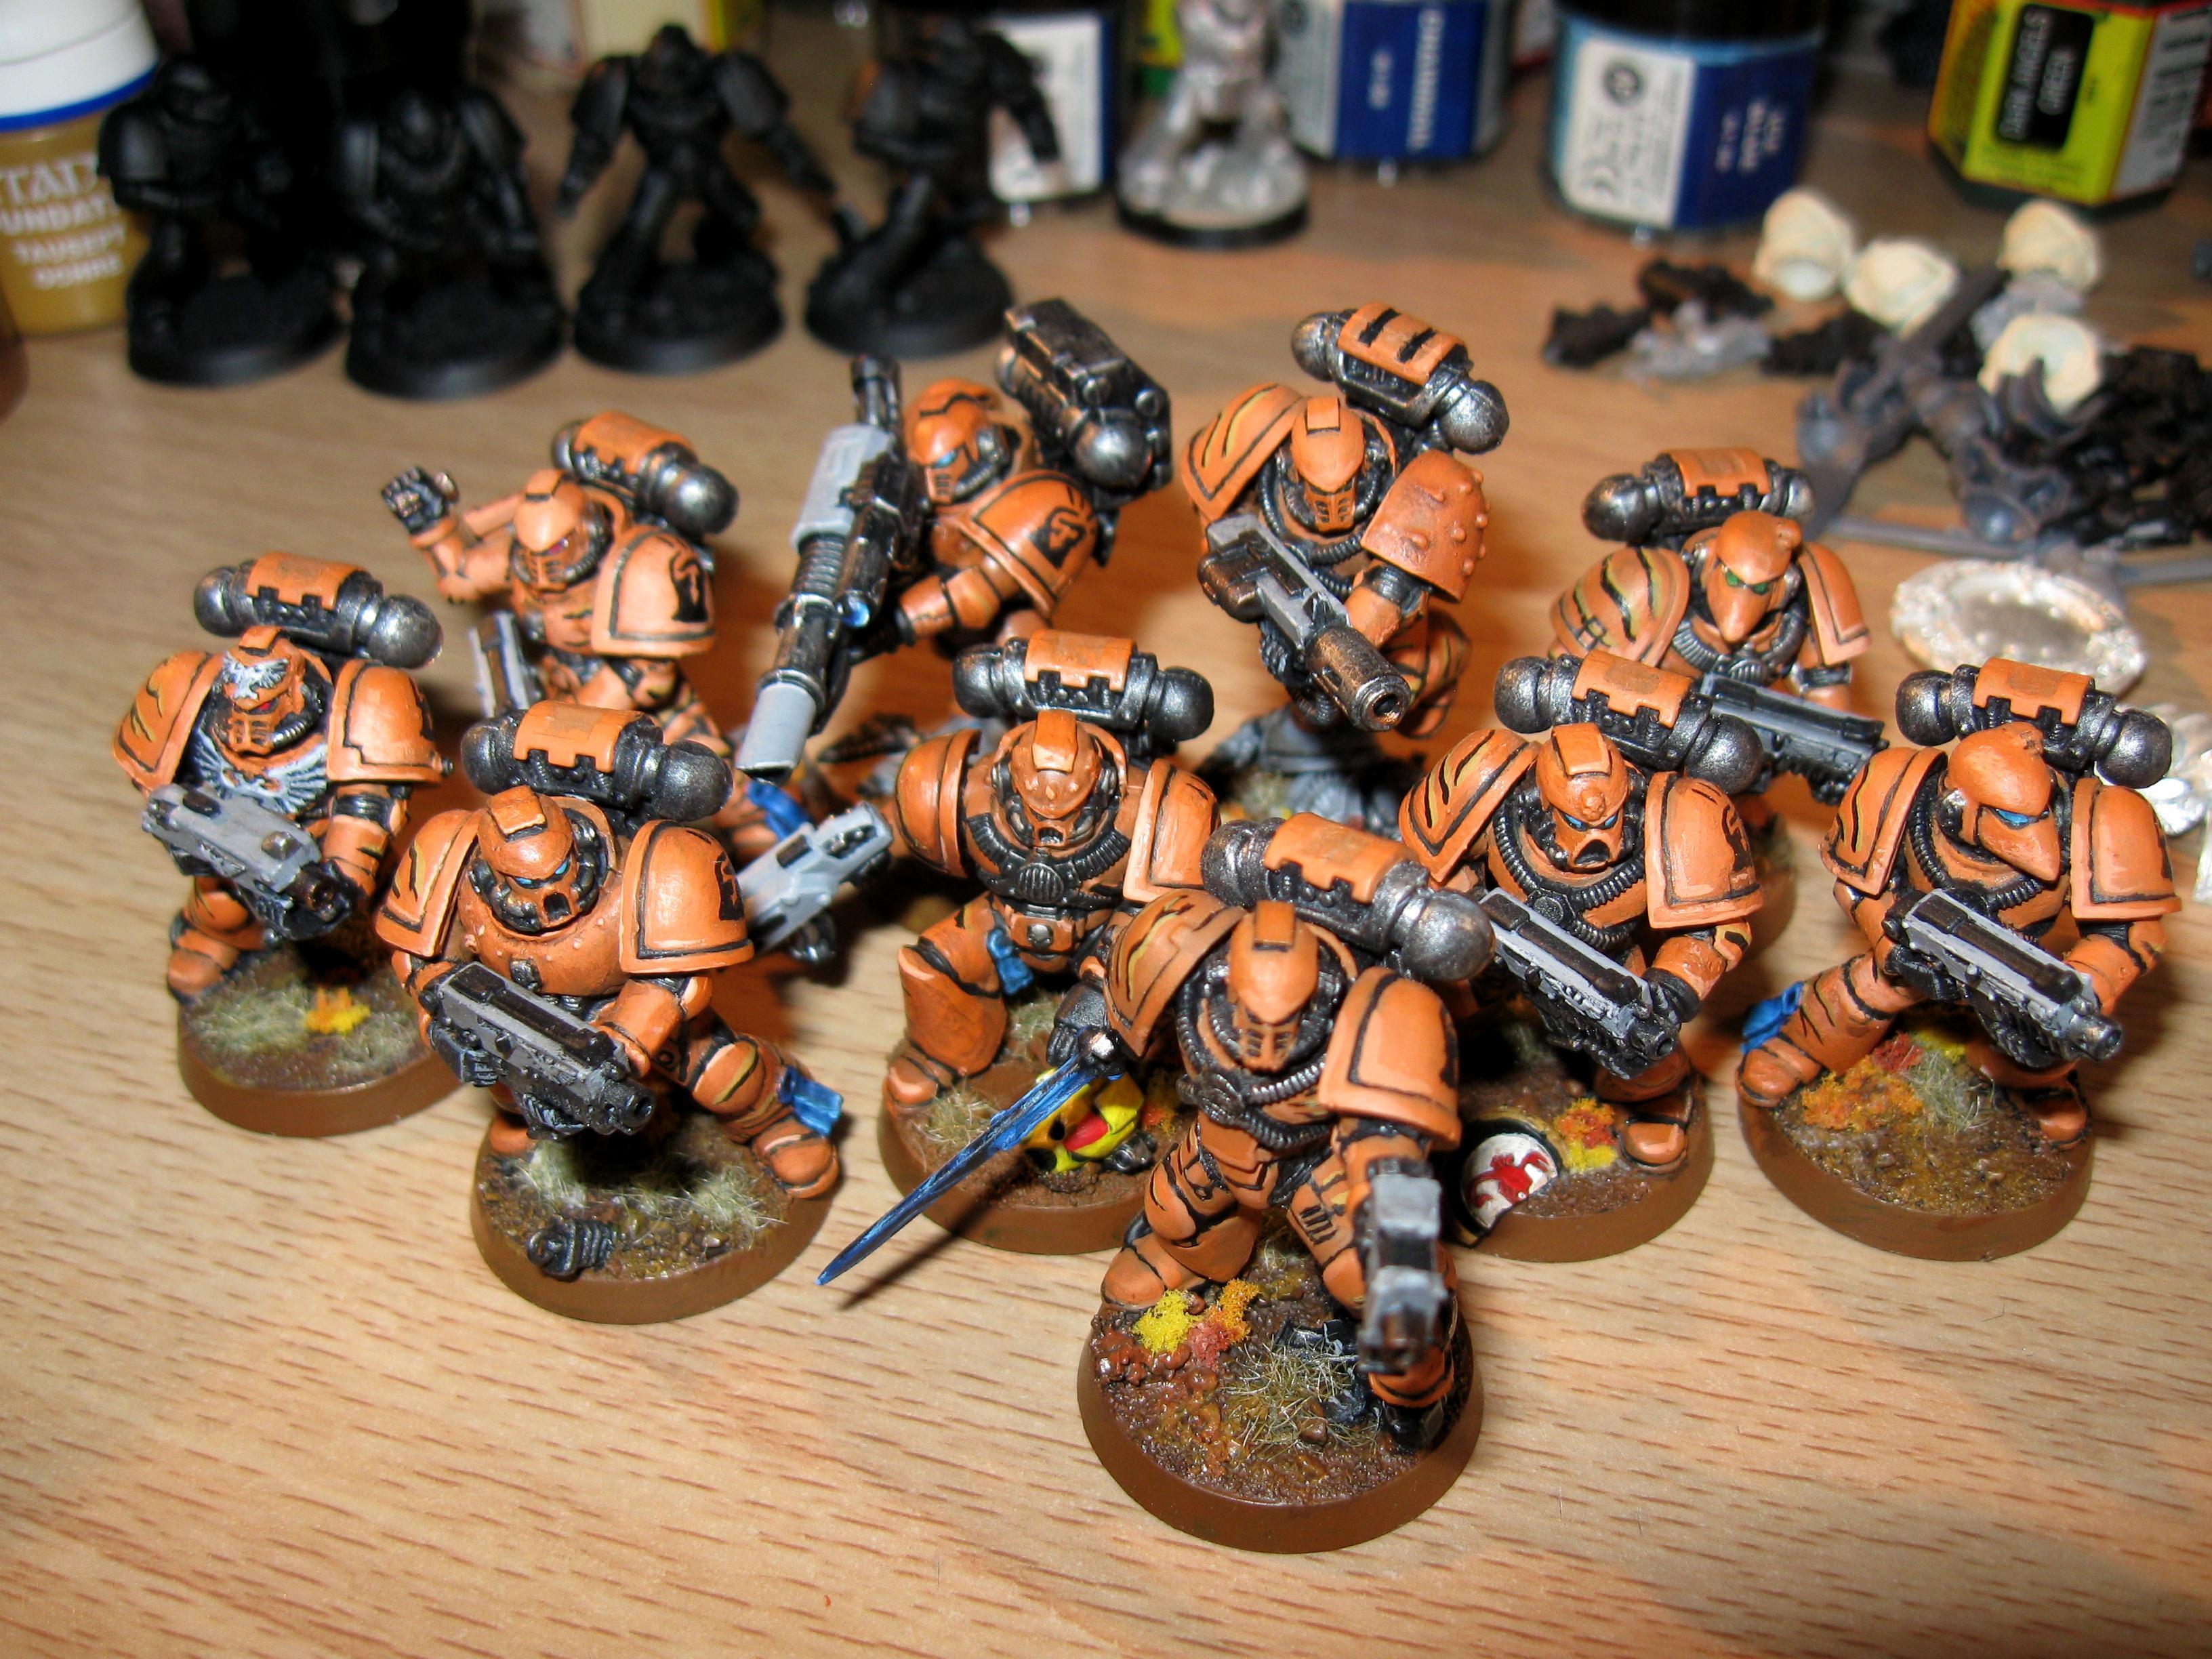 Astral Claw, Badab War, Fire Hawk, Space Marines, Tactical Squad, Tiger Claws, Warhammer 40,000